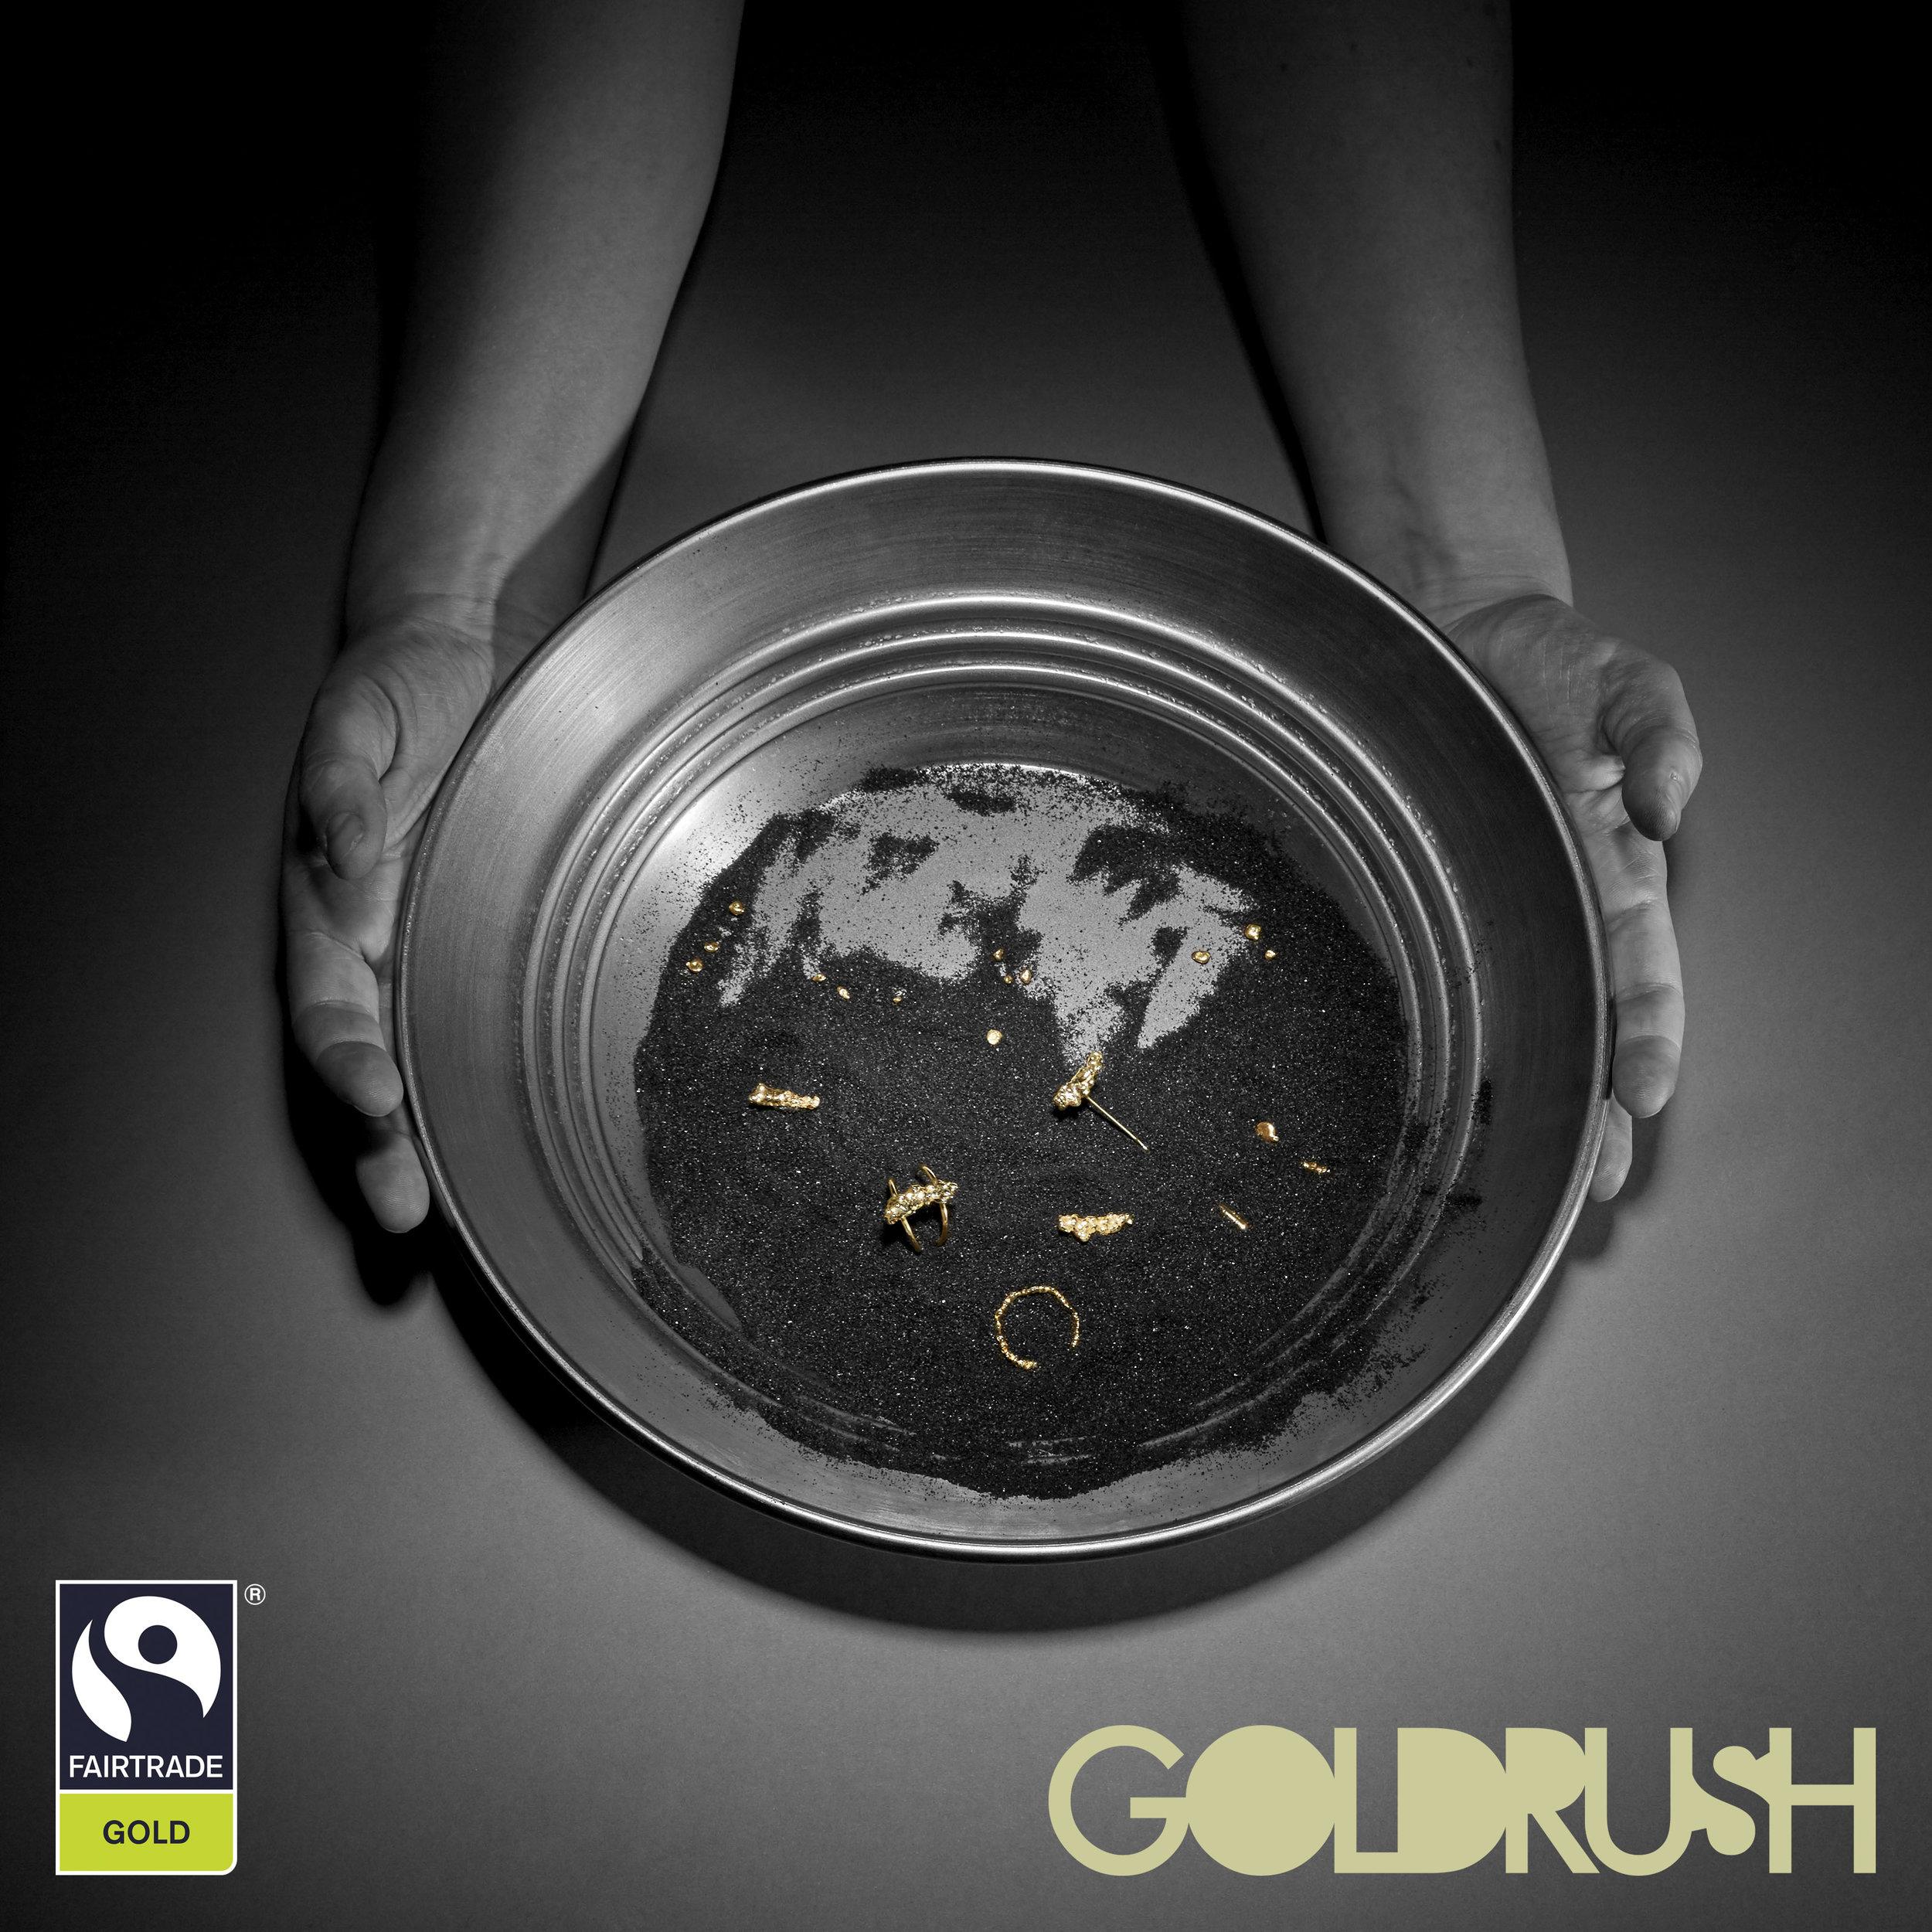 GoldRush_PanHands_Logos_.jpg